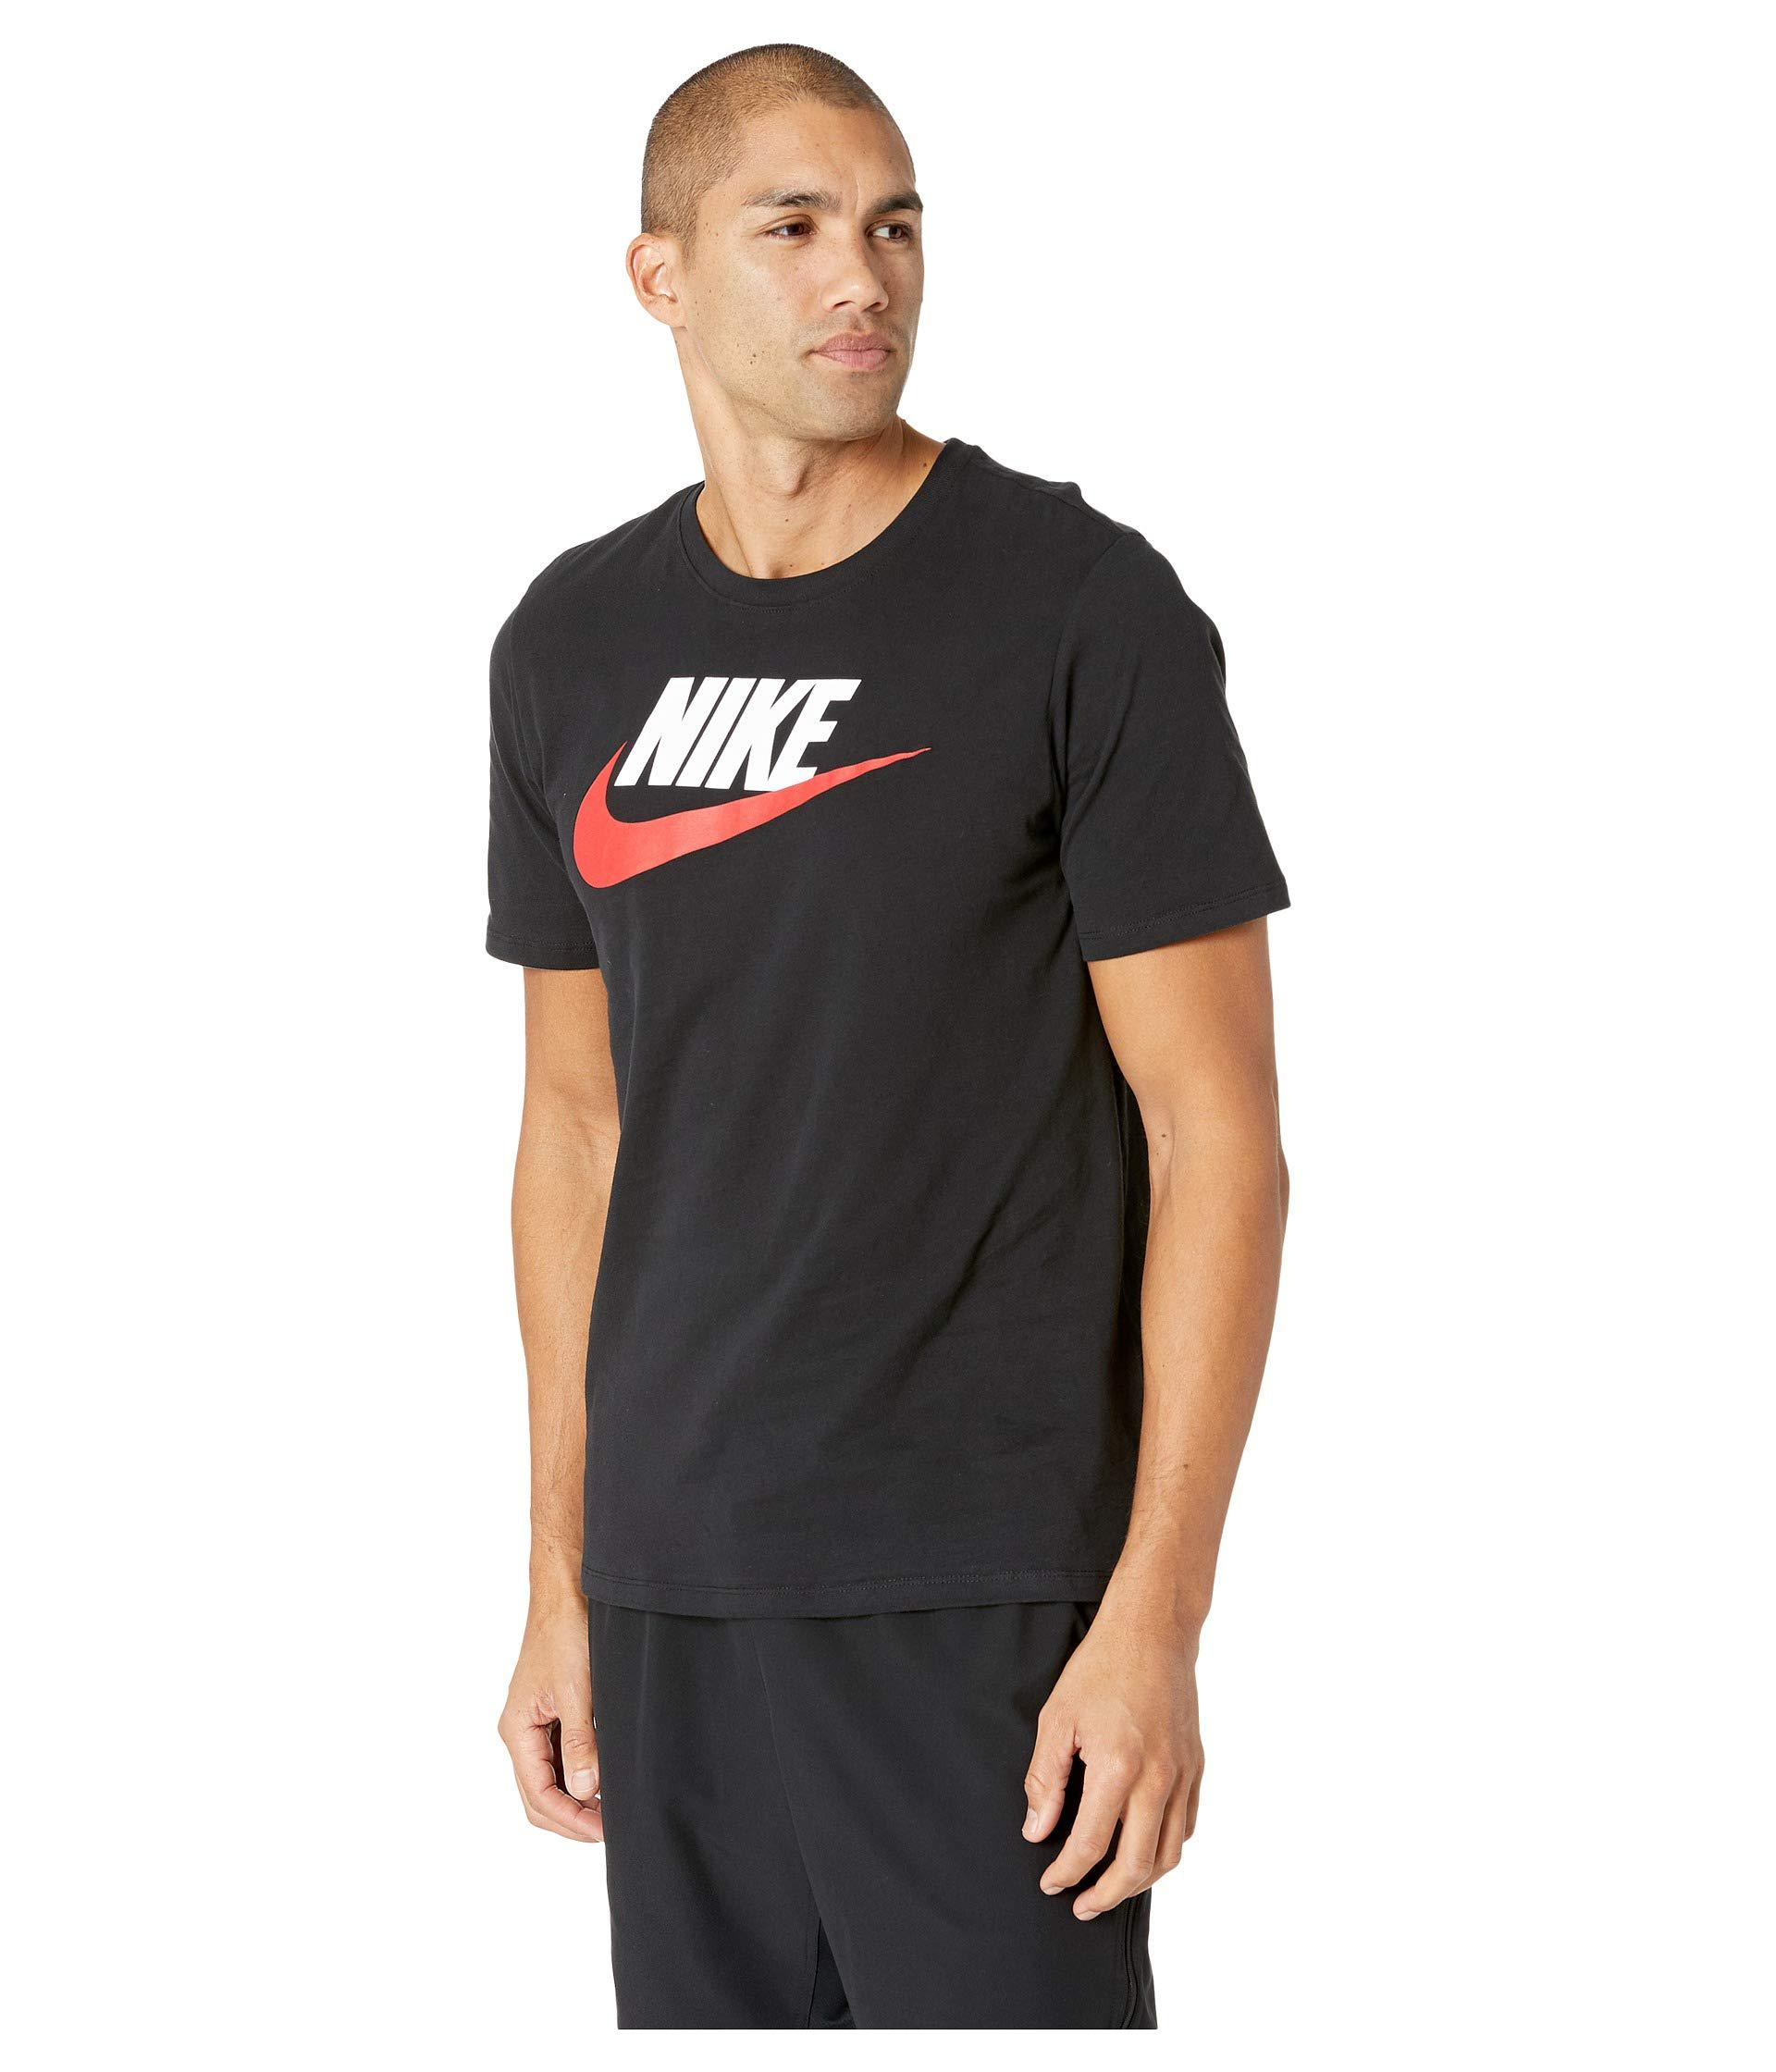 0cde6a0589f Nike Sportswear Icon Short Sleeve T Shirt Mens – EDGE Engineering ...